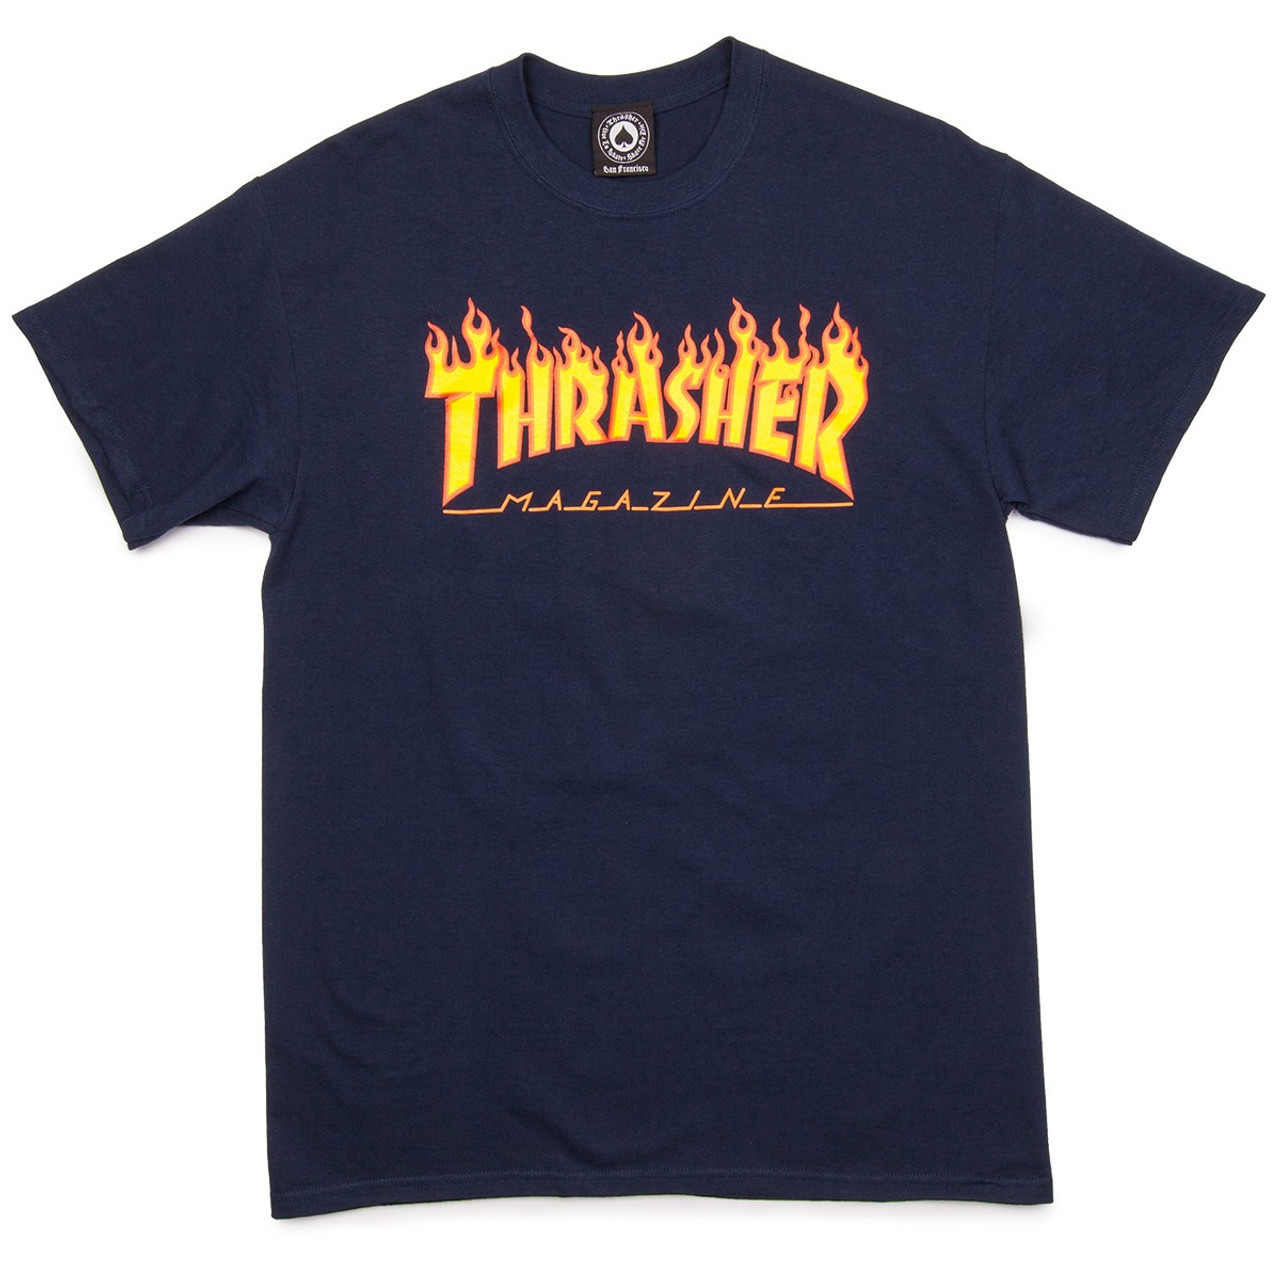 677a13e1453e Thrasher Flame Logo Tshirt Navy Xxl